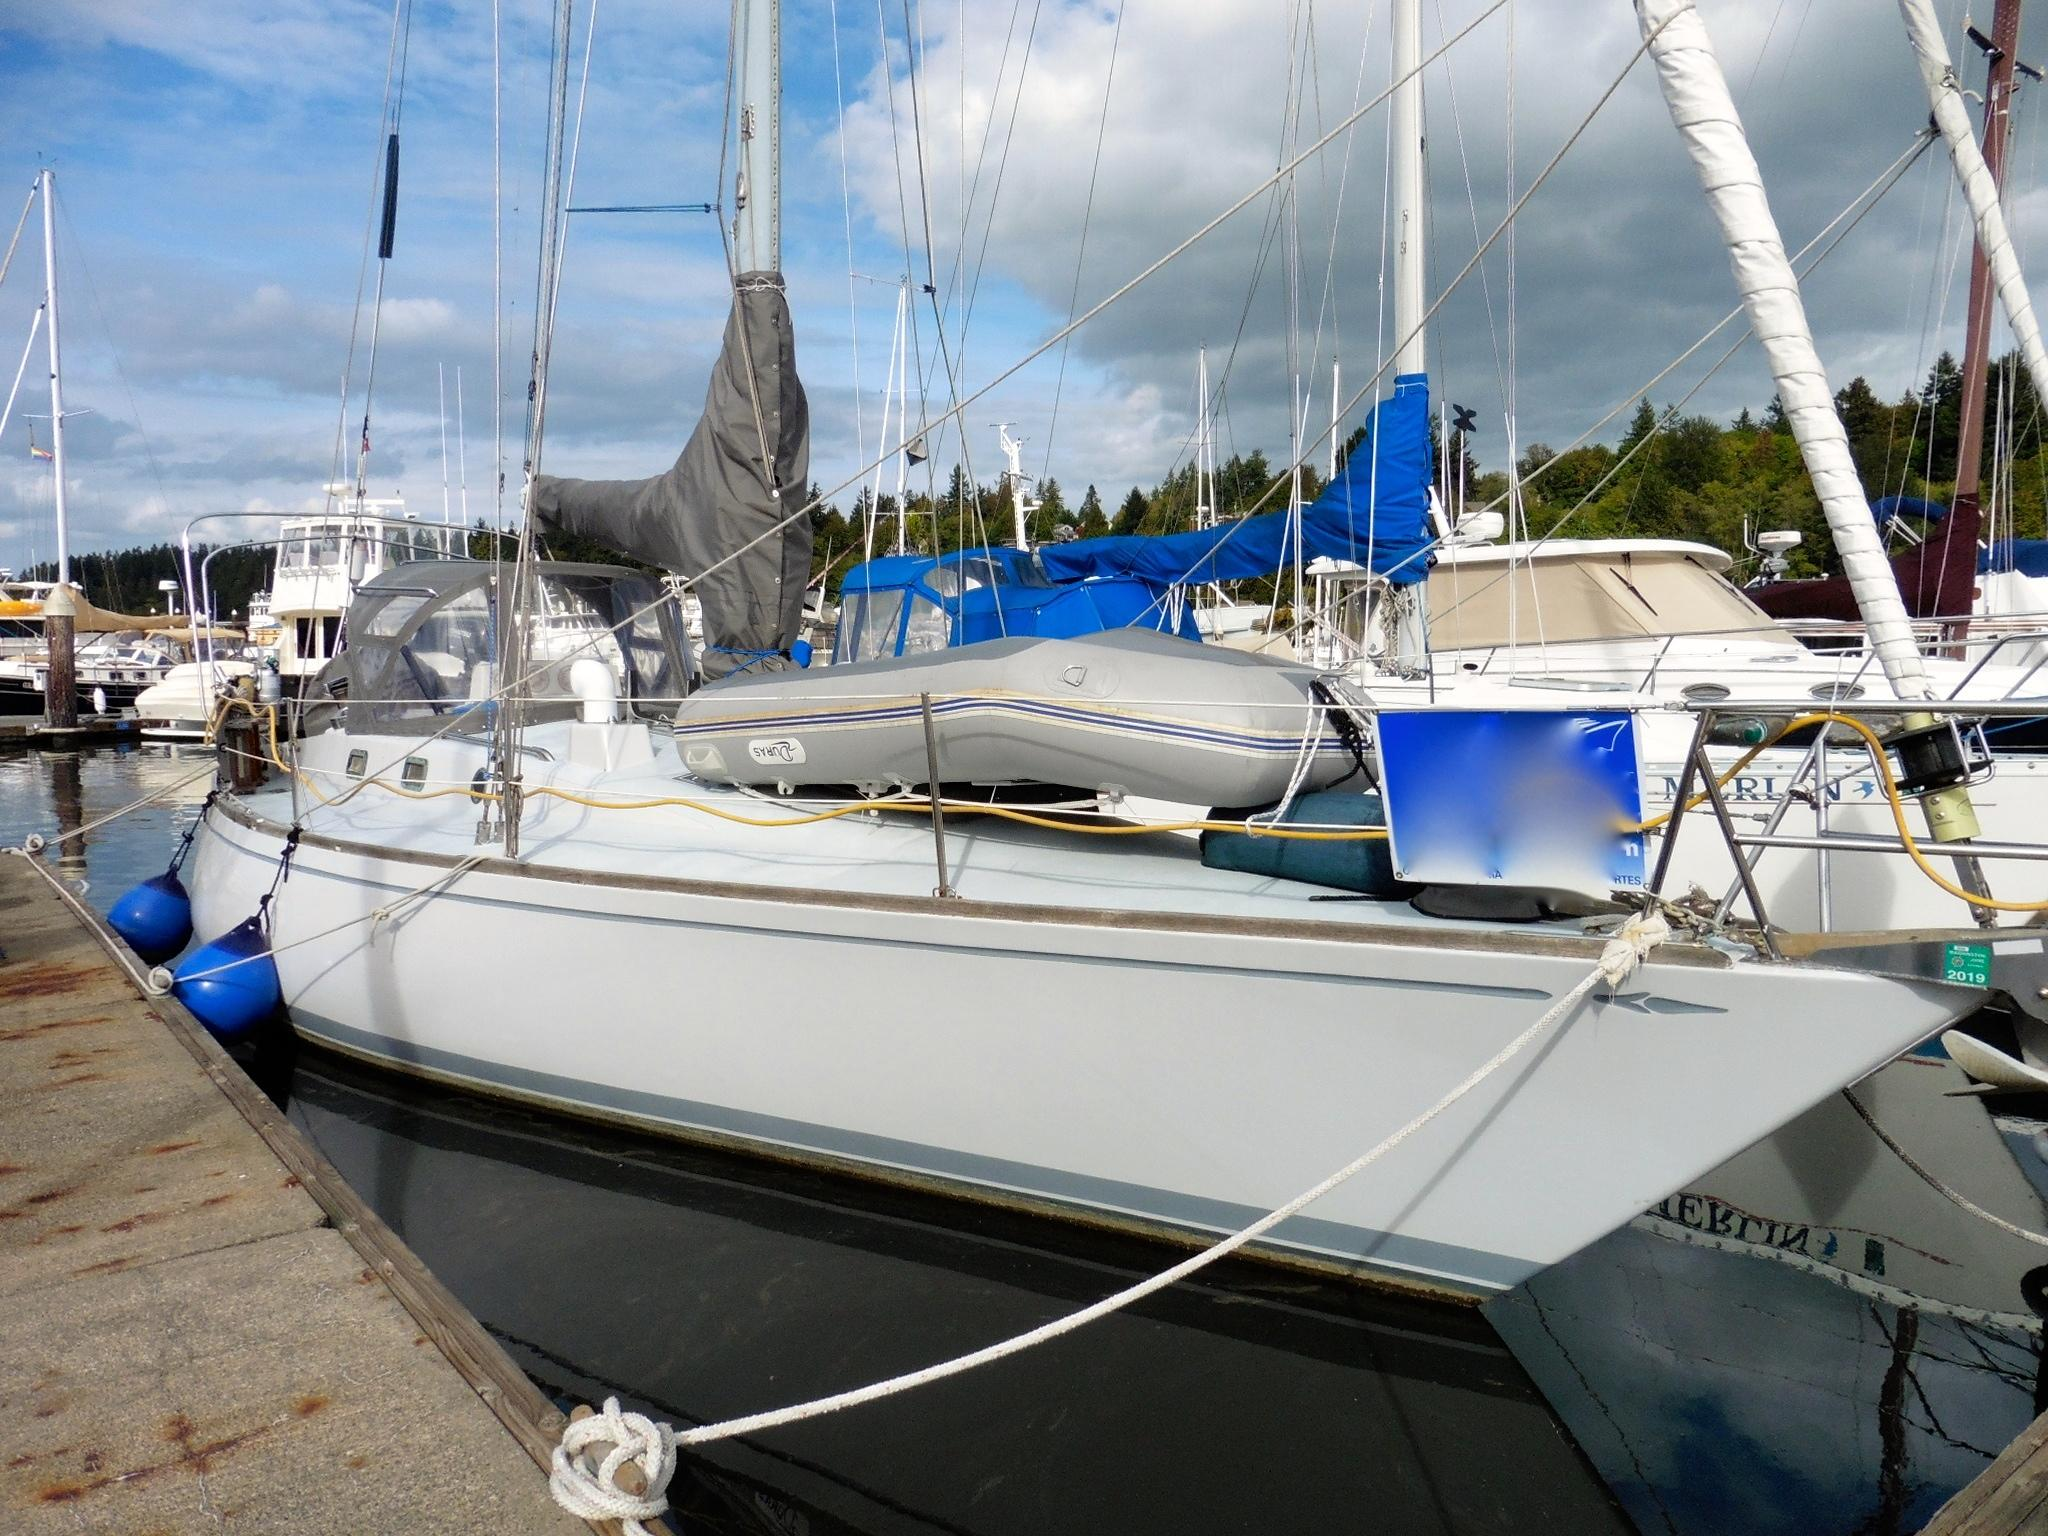 1972 Yankee 38 Sail Boat For Sale Wwwyachtworldcom